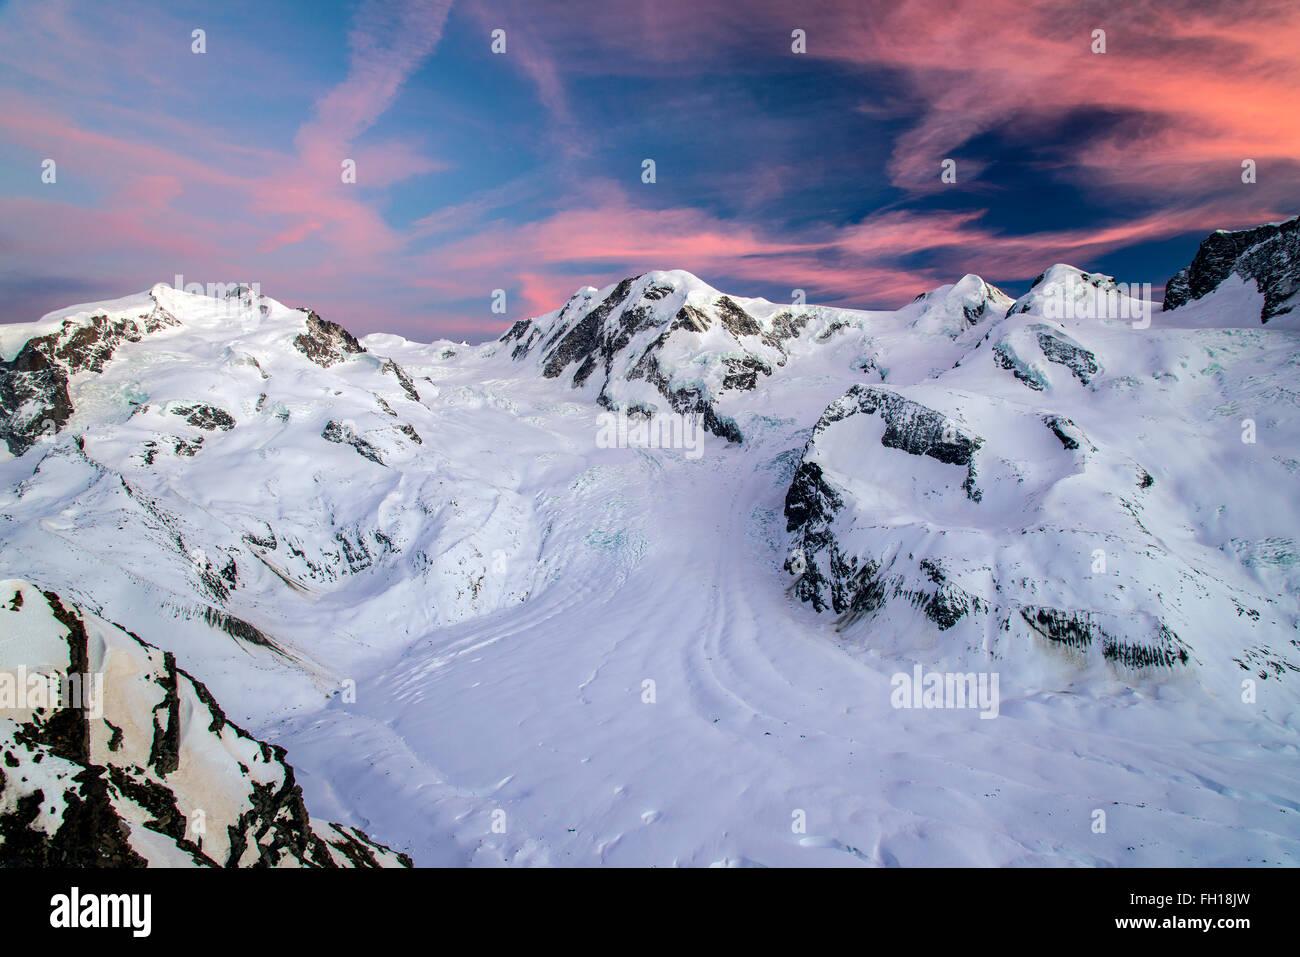 Sunset view over Monte Rosa and Gorner glacier, Zermatt, Wallis or Valais, Switzerland - Stock Image